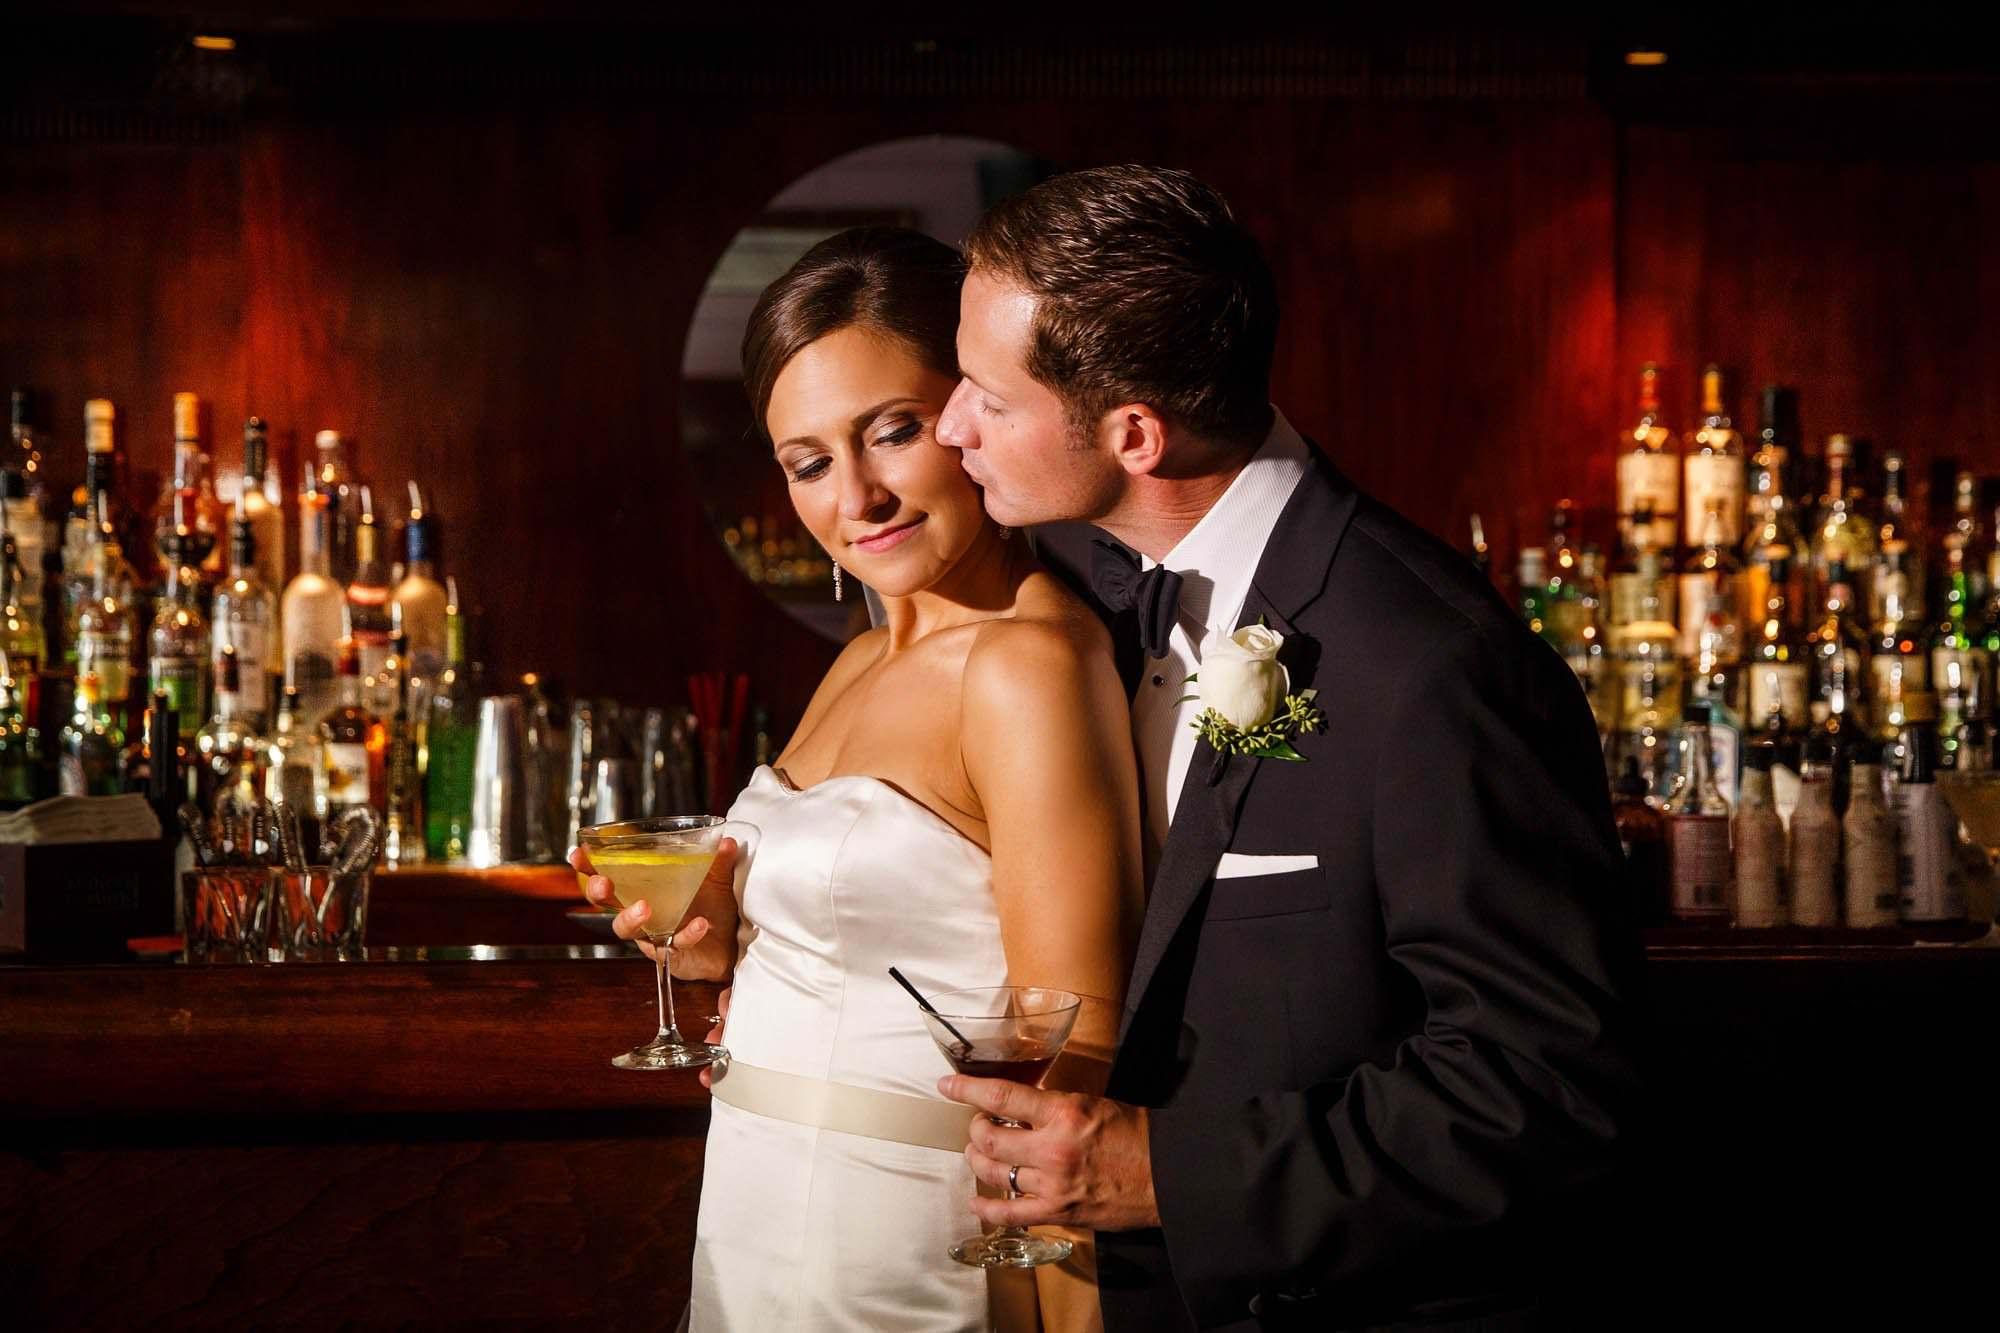 009-velvet-tango-room-cleveland-wedding-photographer-genevieve-nisly-photography